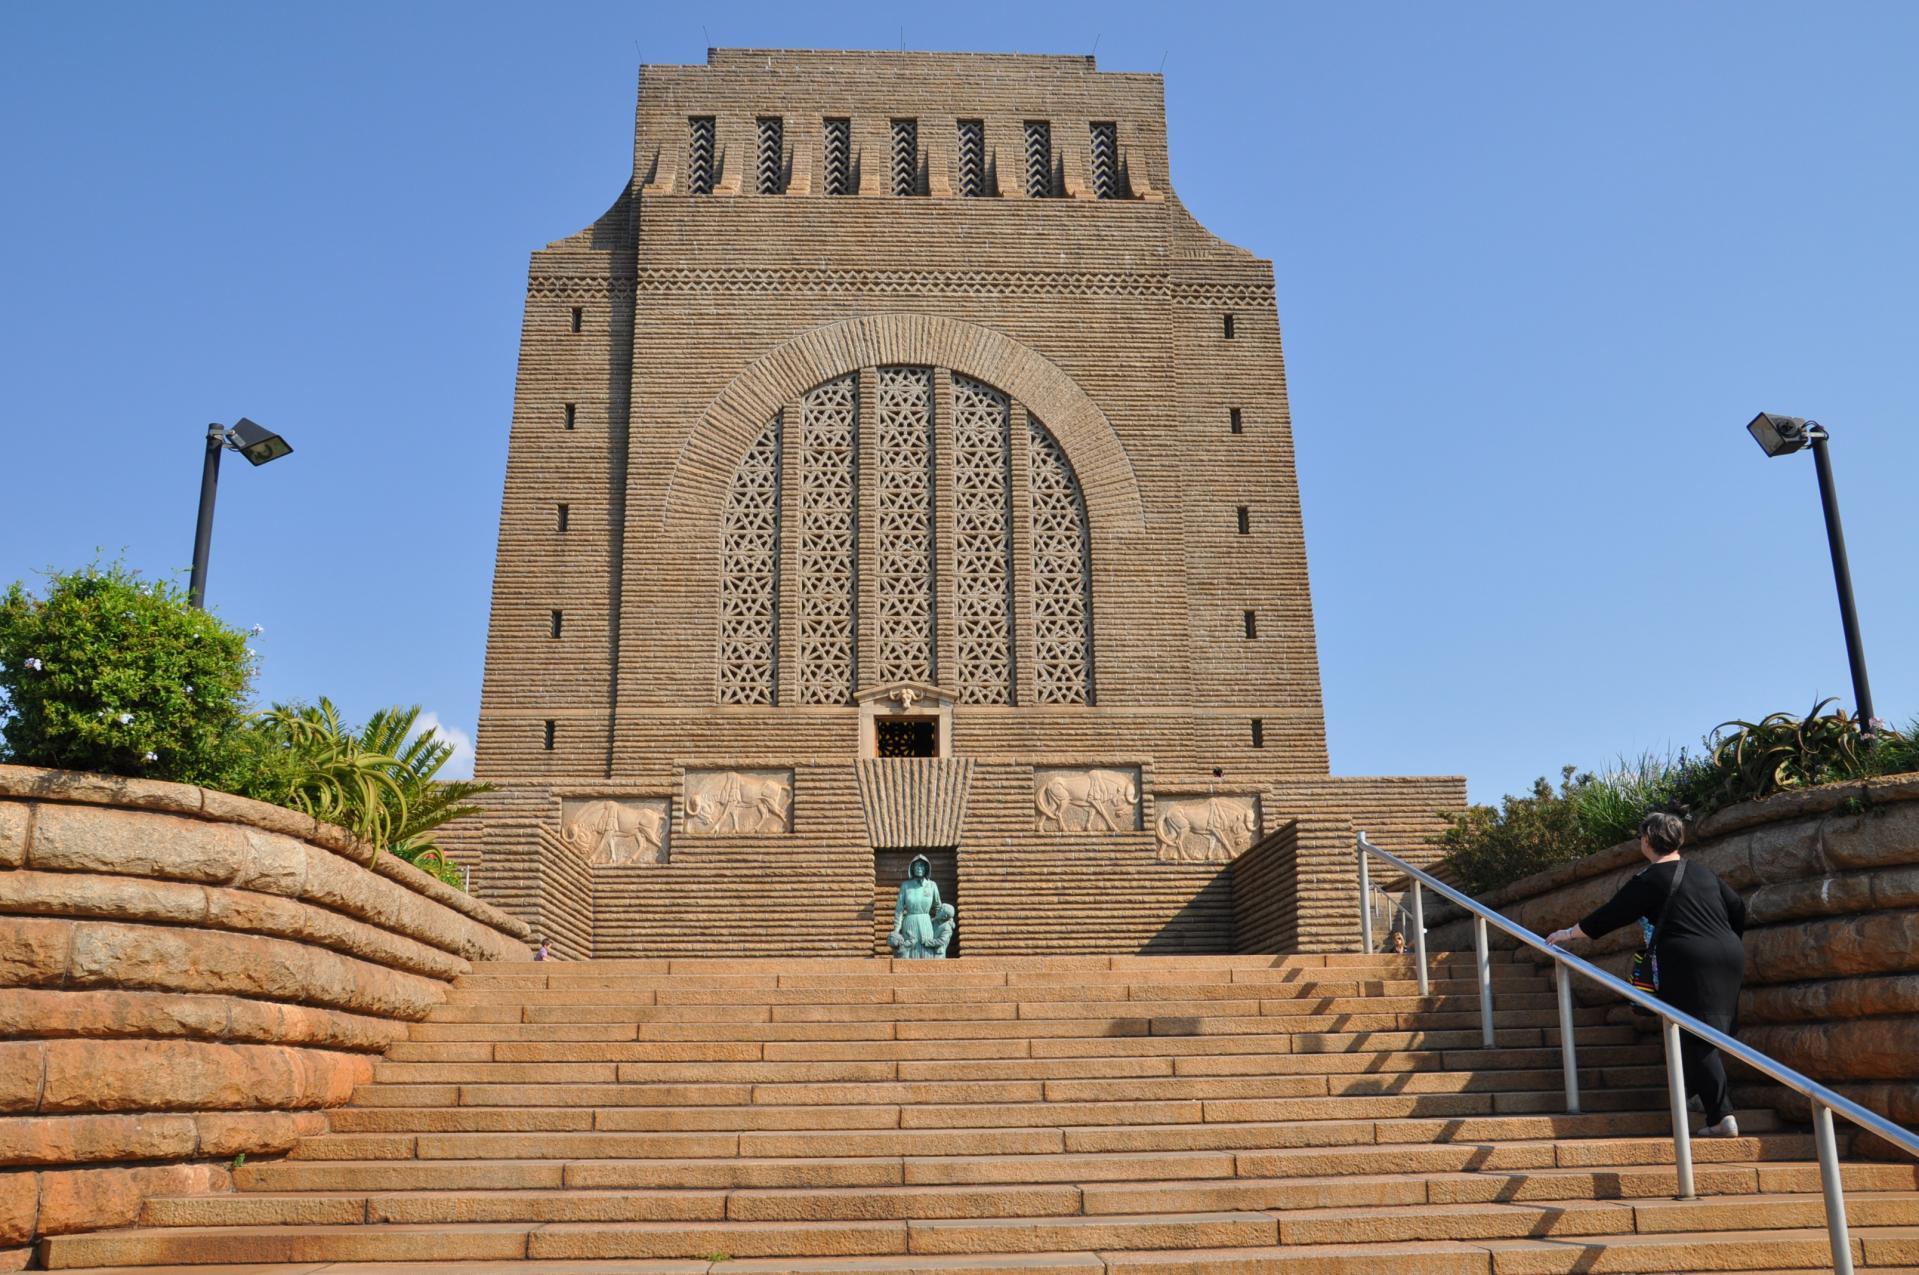 Voortrekken Monument à Pretoria